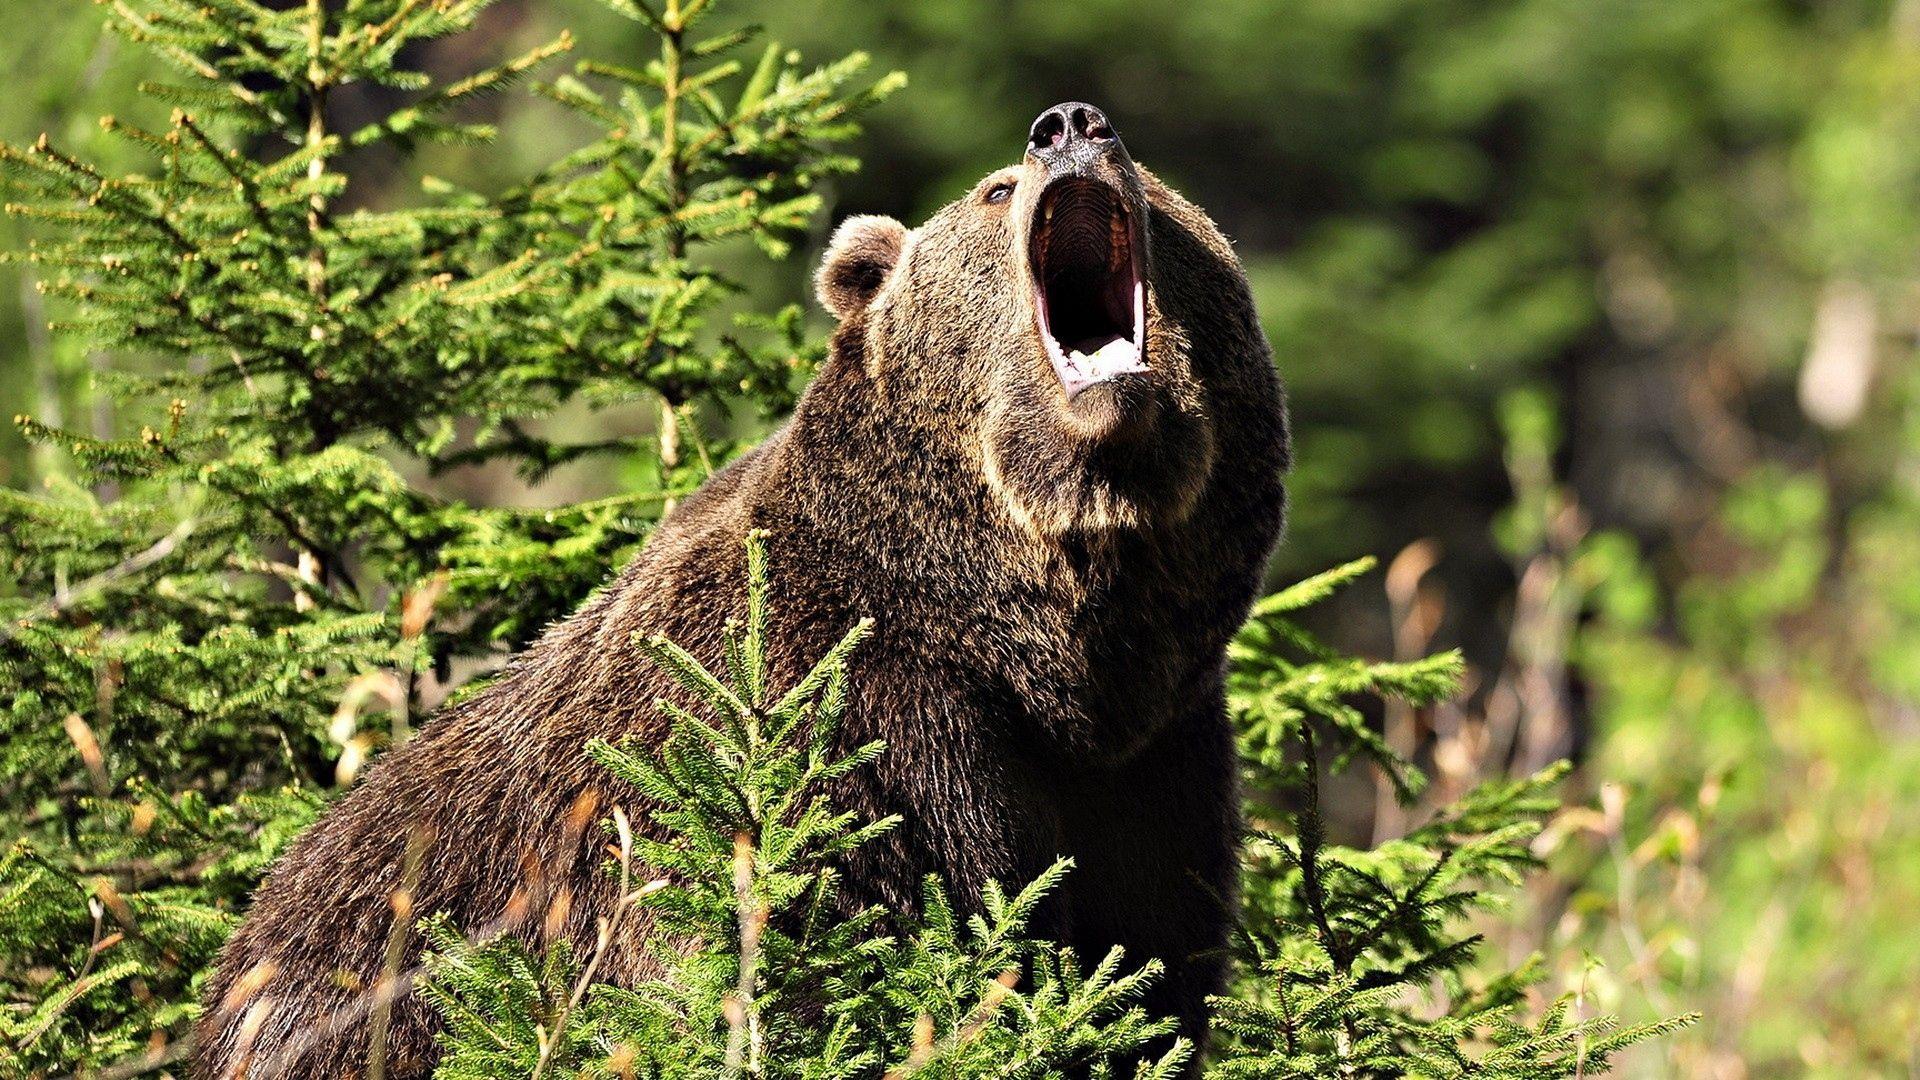 Wallpaper Bear, Brown, Aggression, Grass, Forest